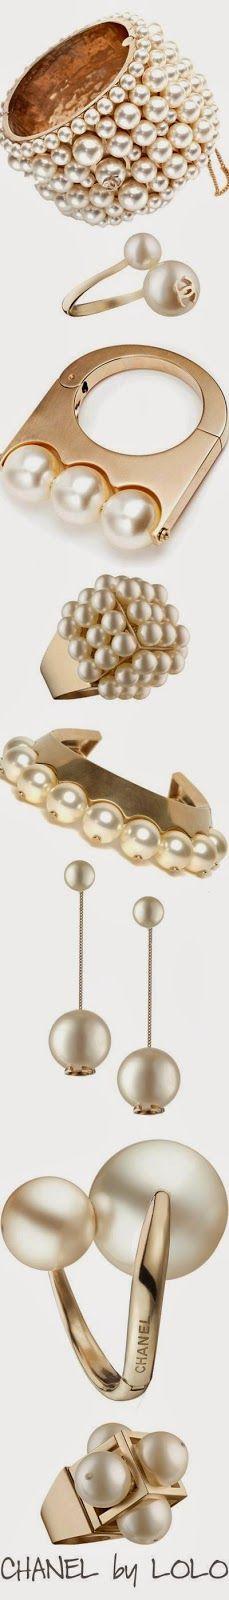 pearls - dirtbin designs